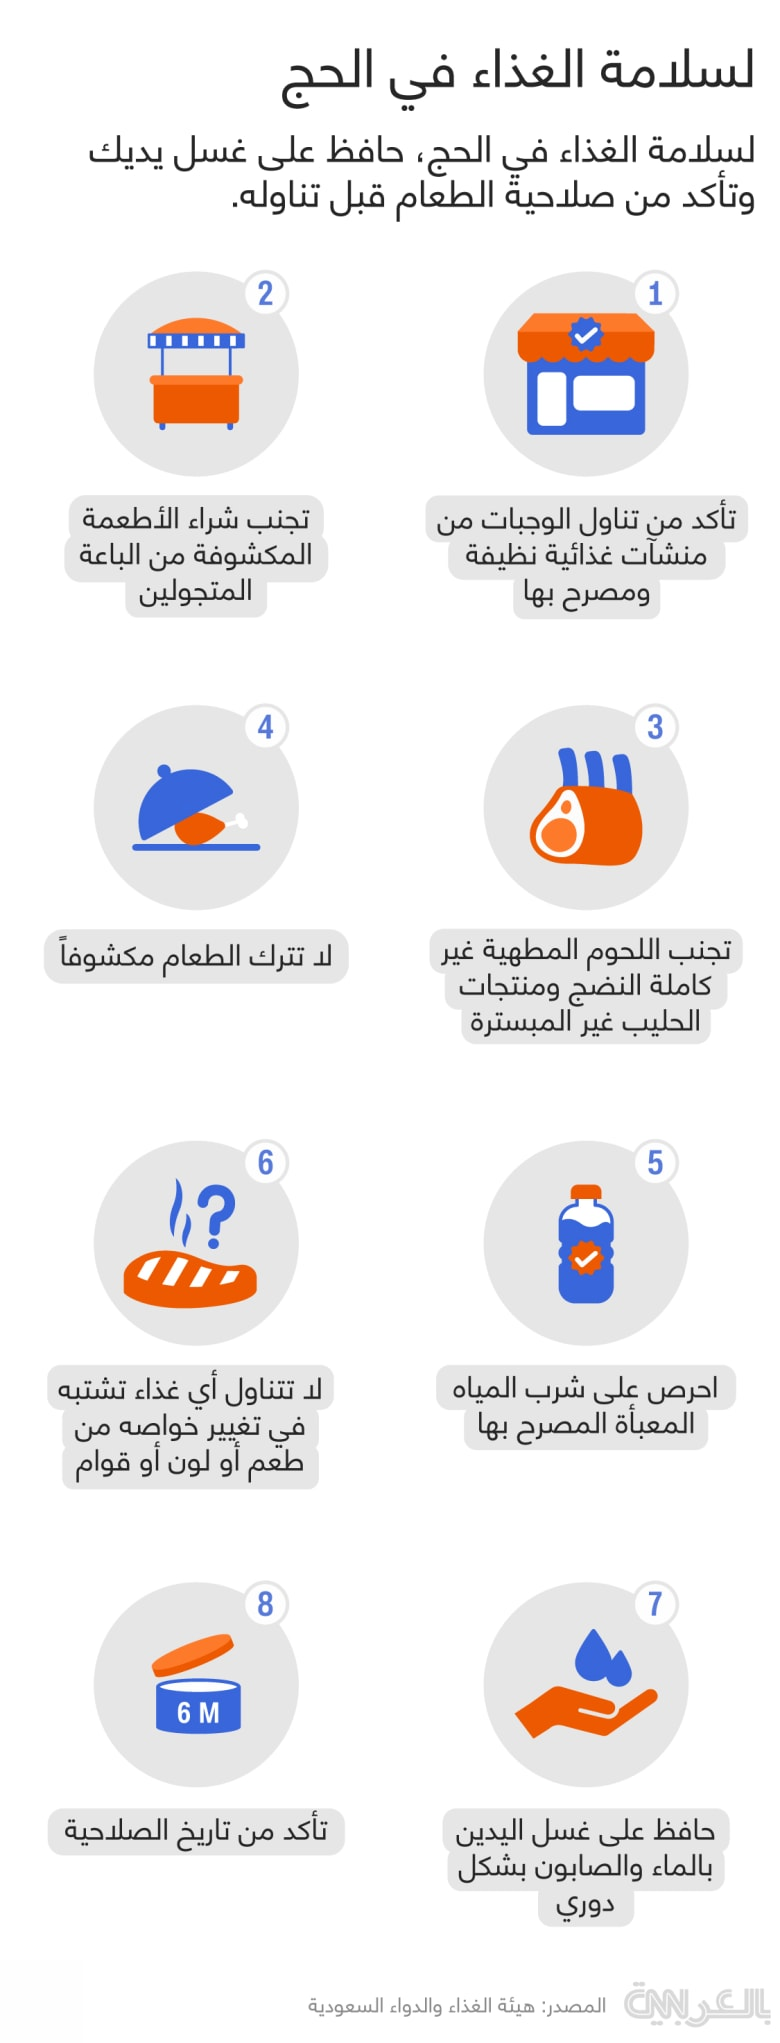 8-tips-safety-food-Hajj-2021